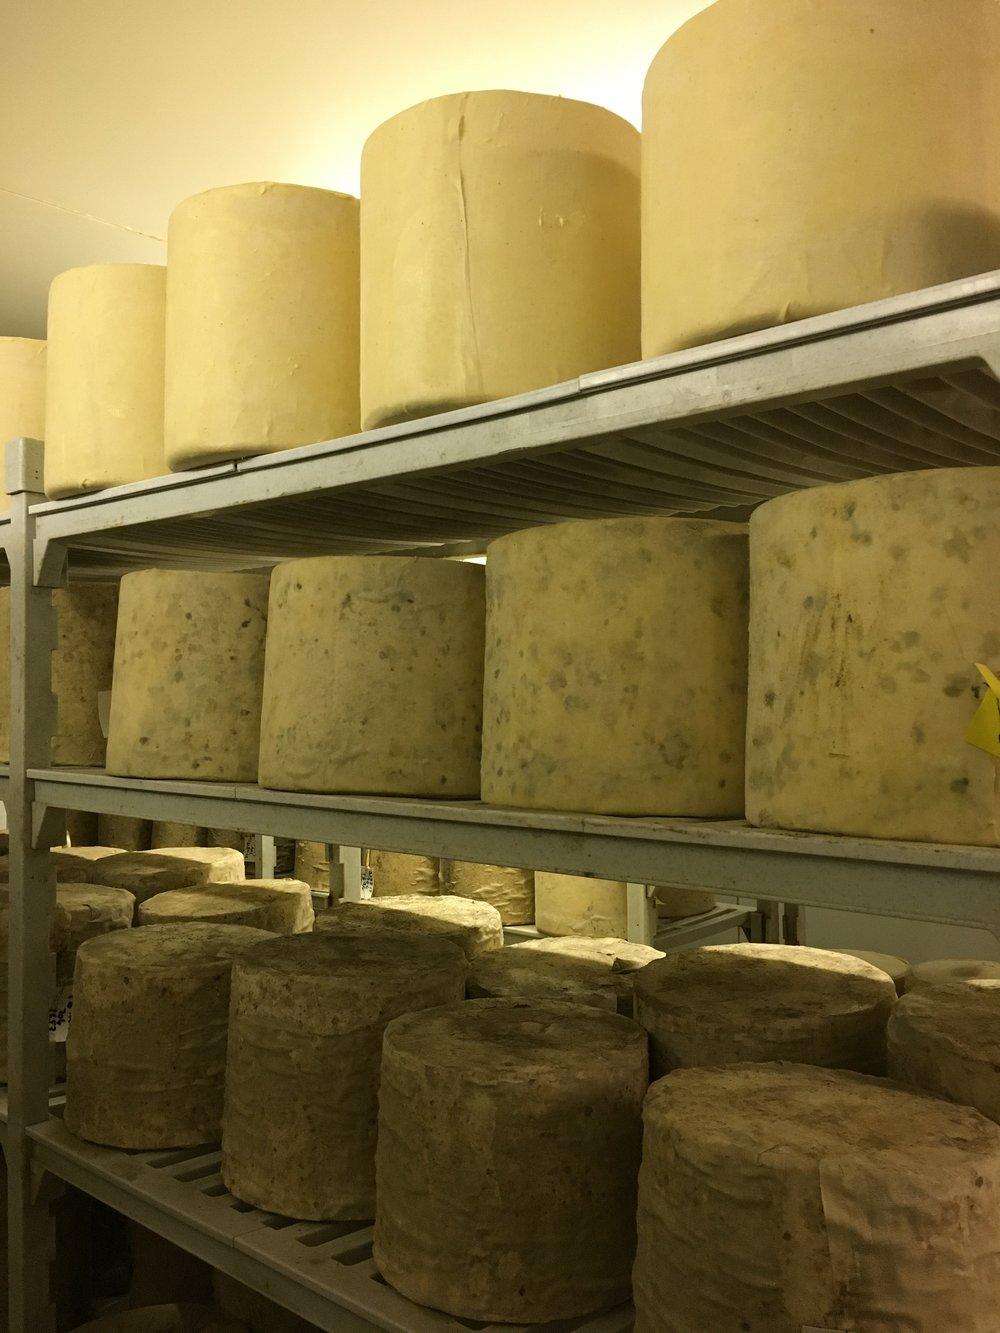 Ferndale maturing cheeses.jpg